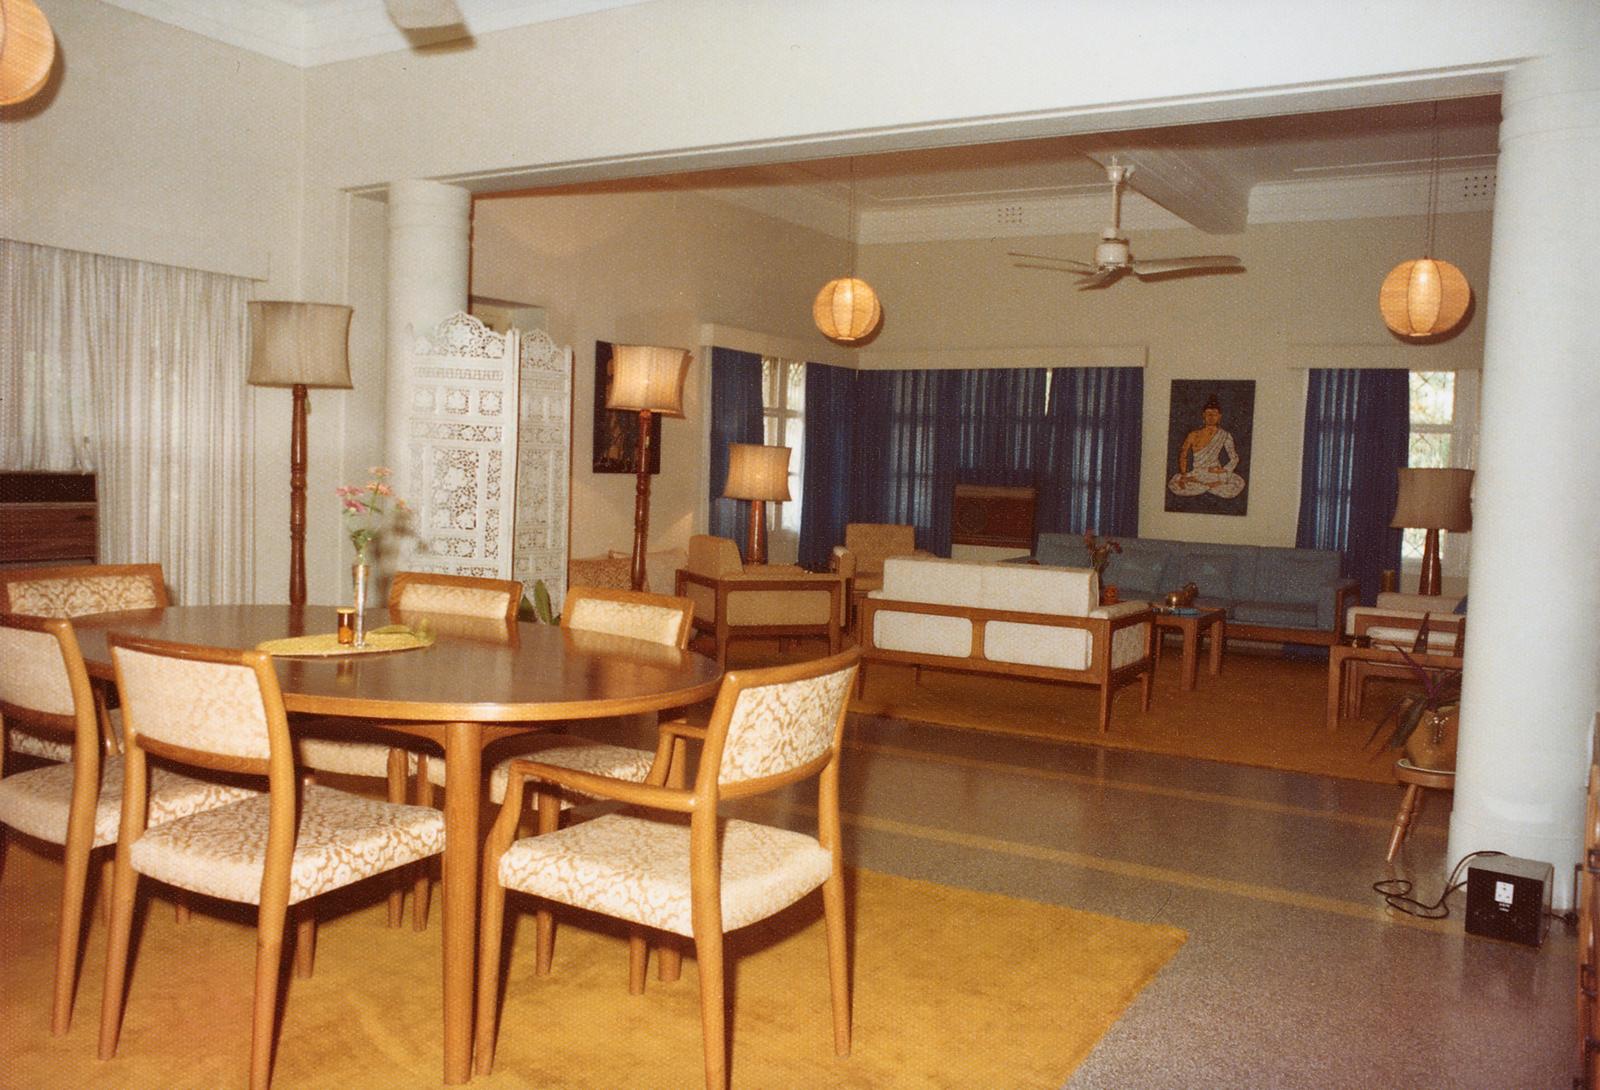 Chennai - Multi-Unit Residential Building - 1977